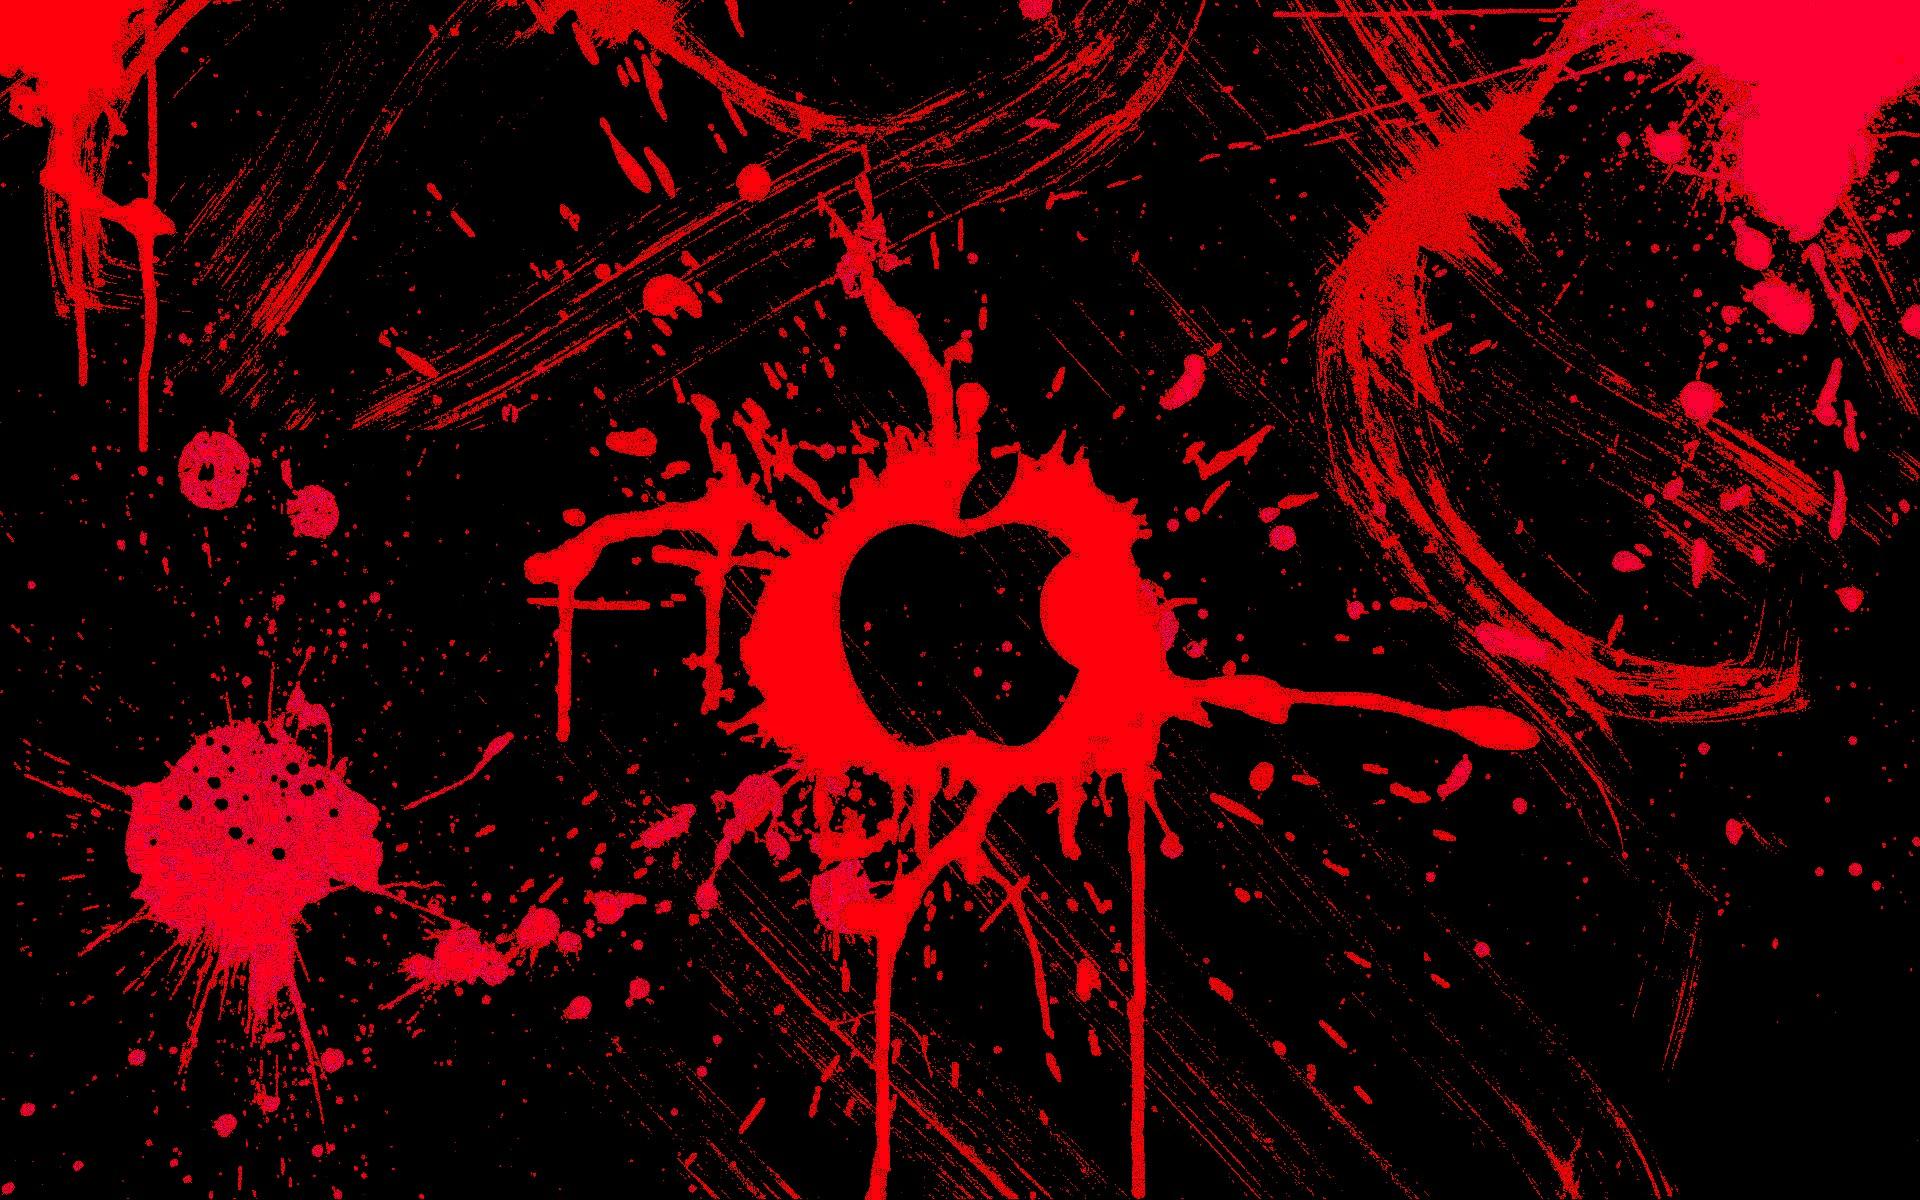 Wallpaper Illustration Red Circle Apple Inc Darkness Computer